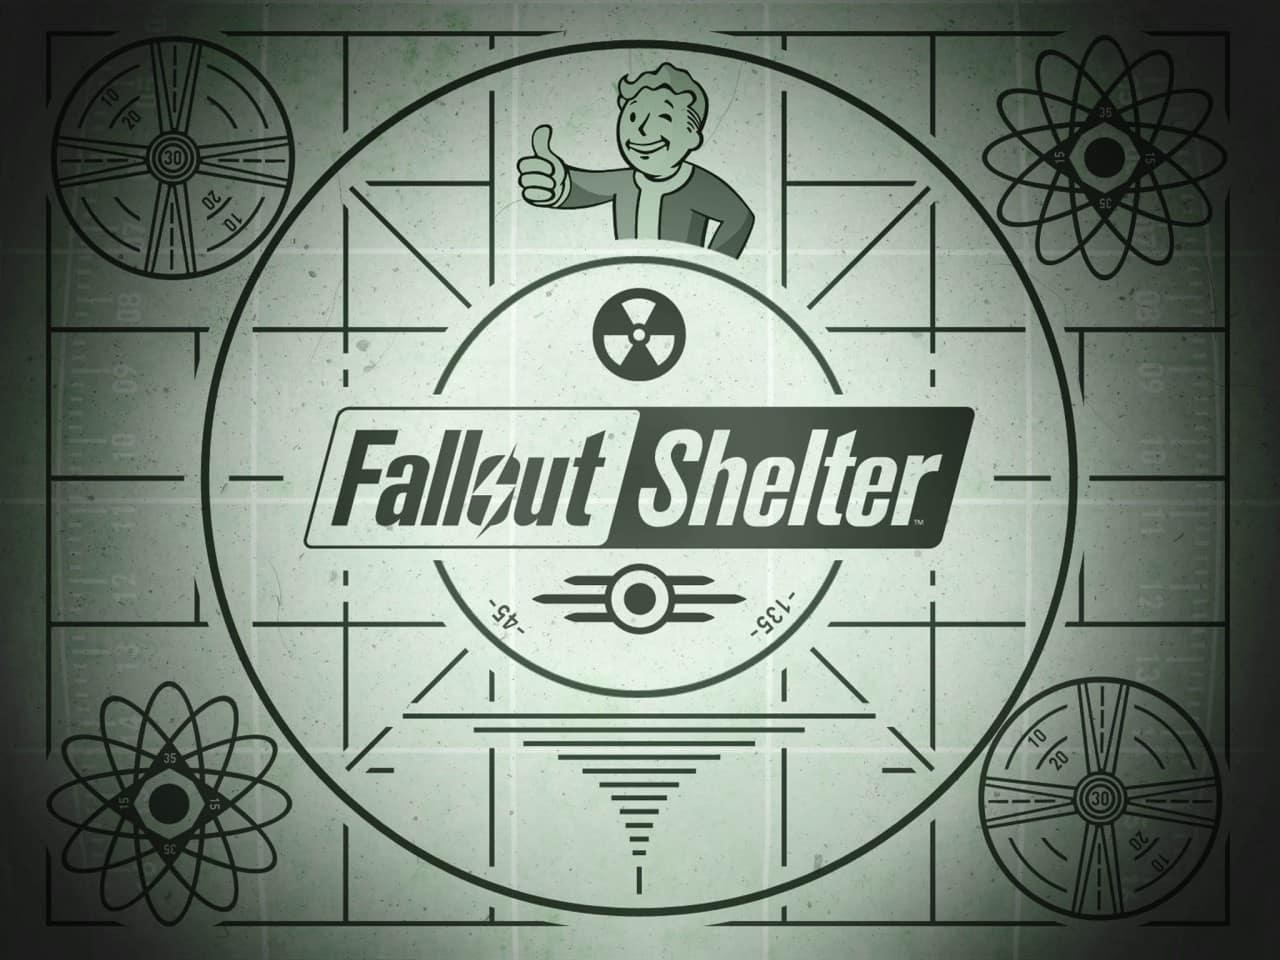 Fallout-Shelter-1280x960